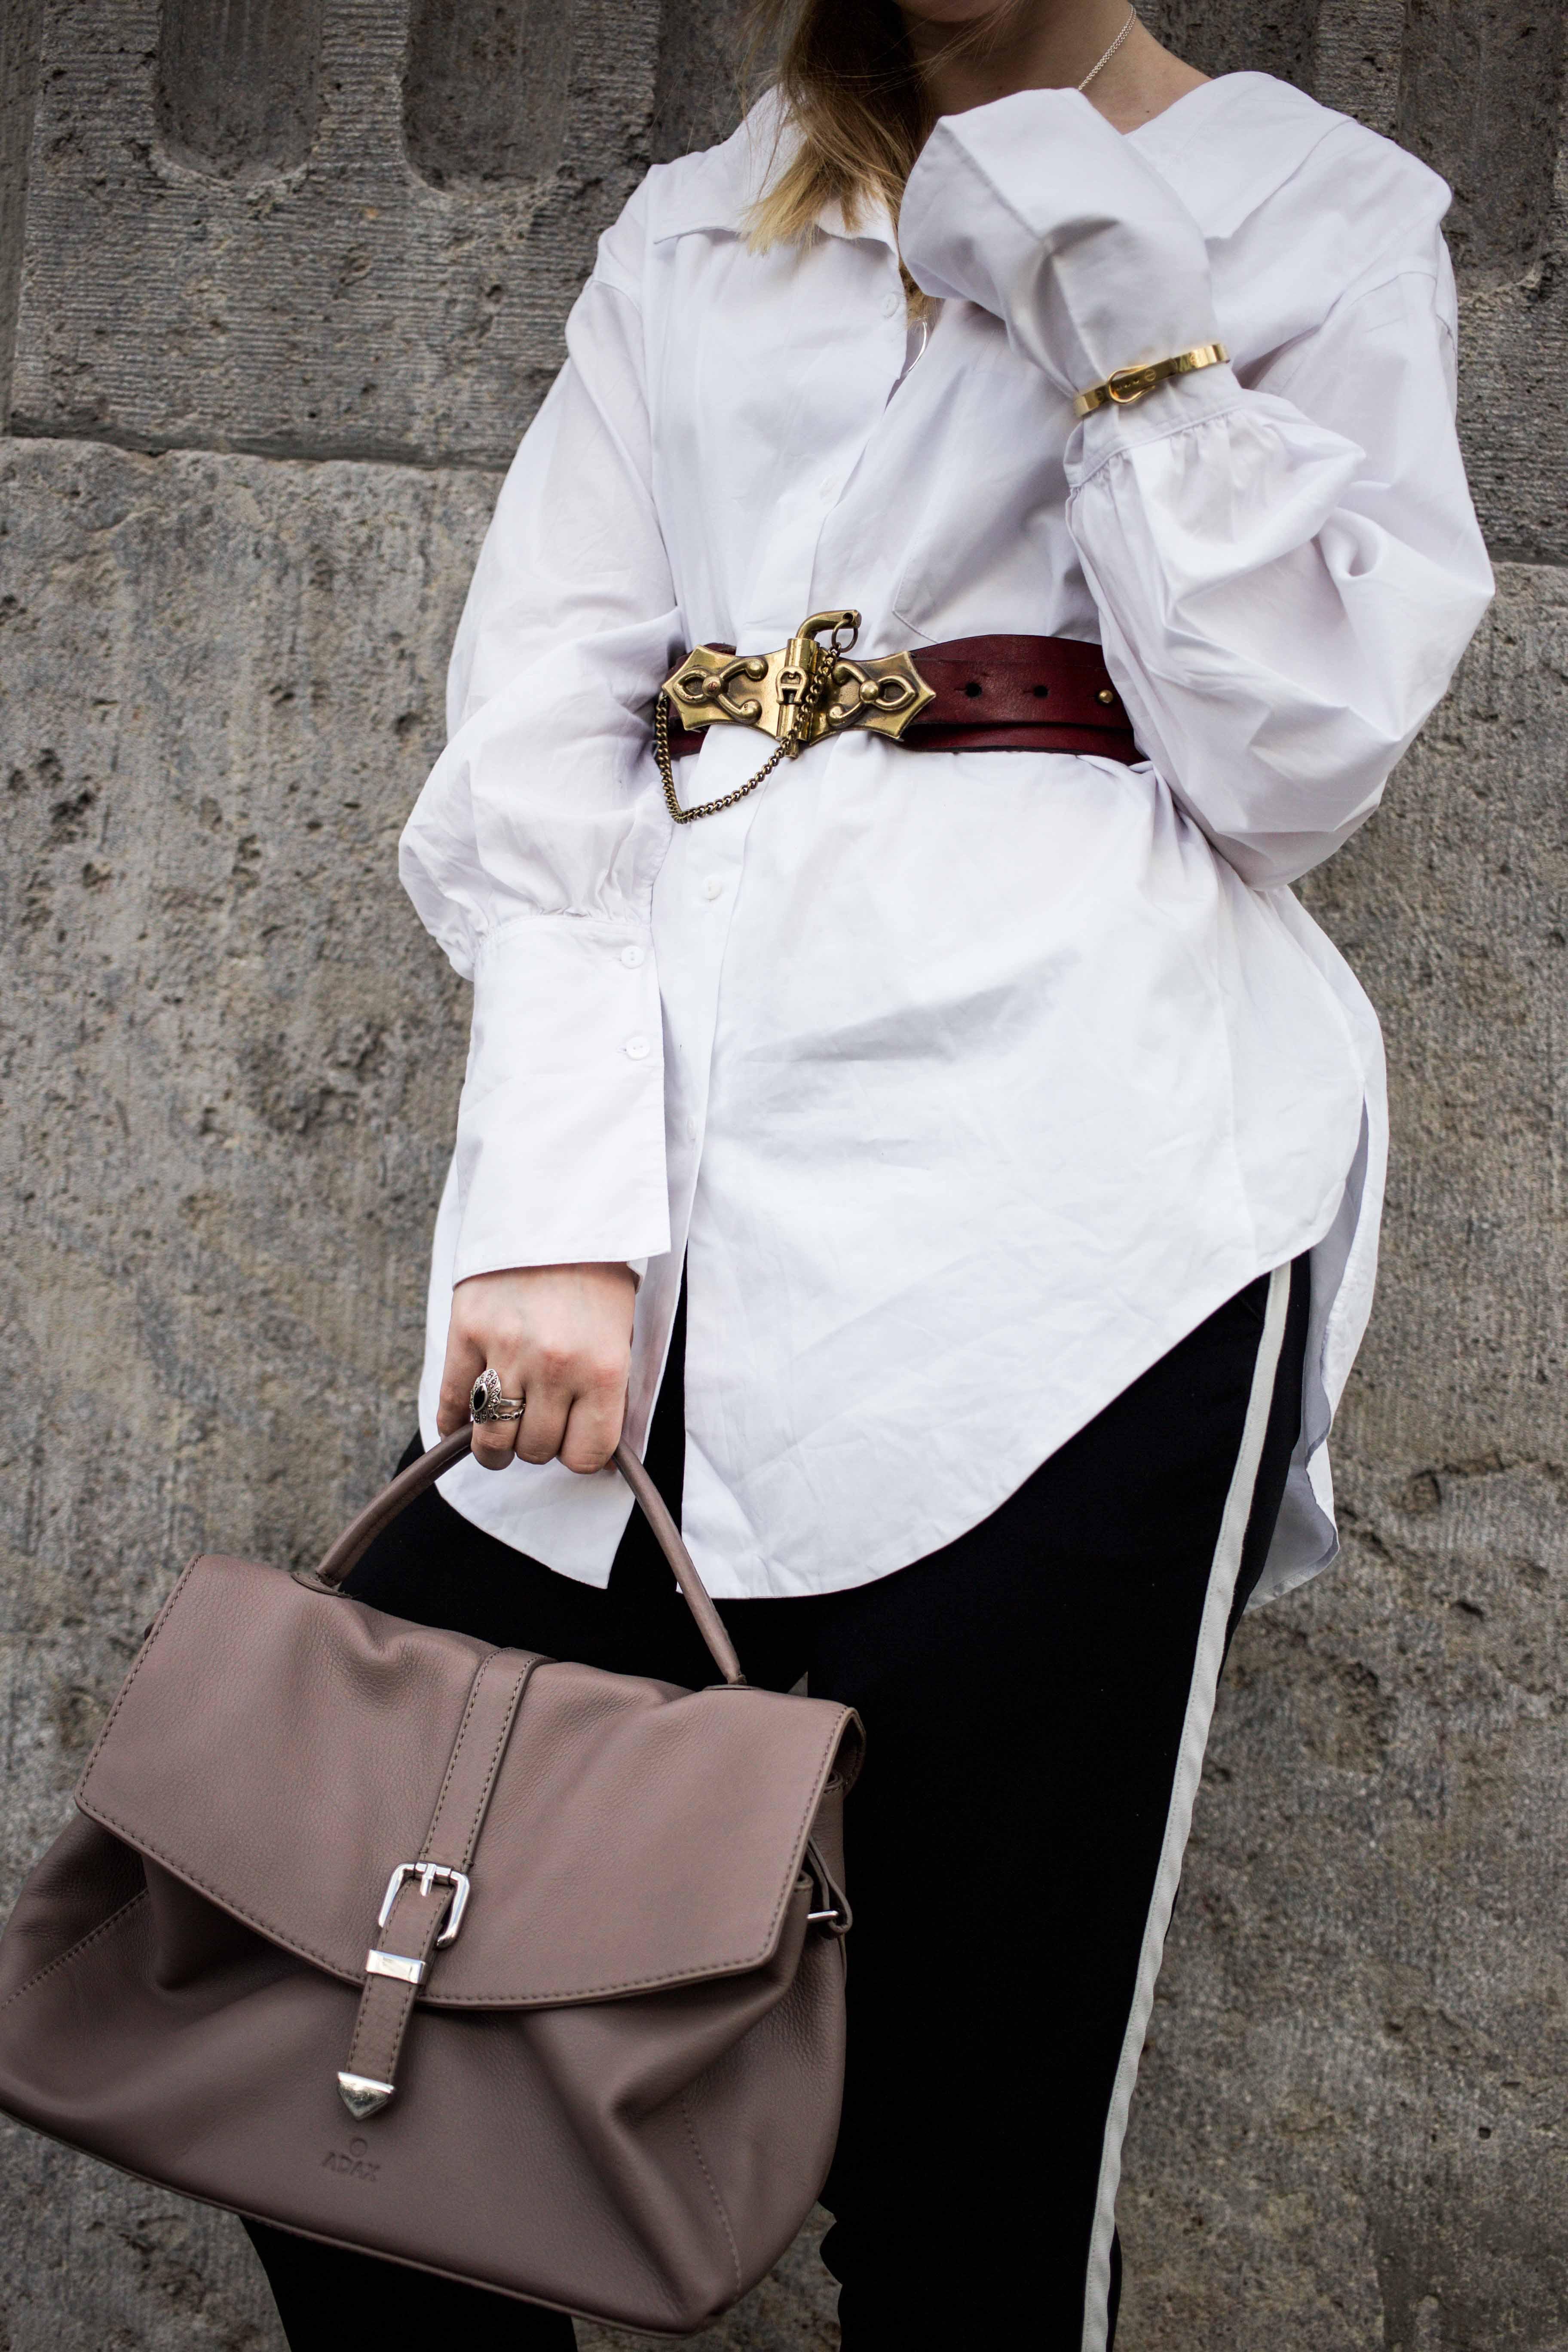 fashionweek-berlin-statement-gürtel-oversized-bluse-outfit-modeblog_6376